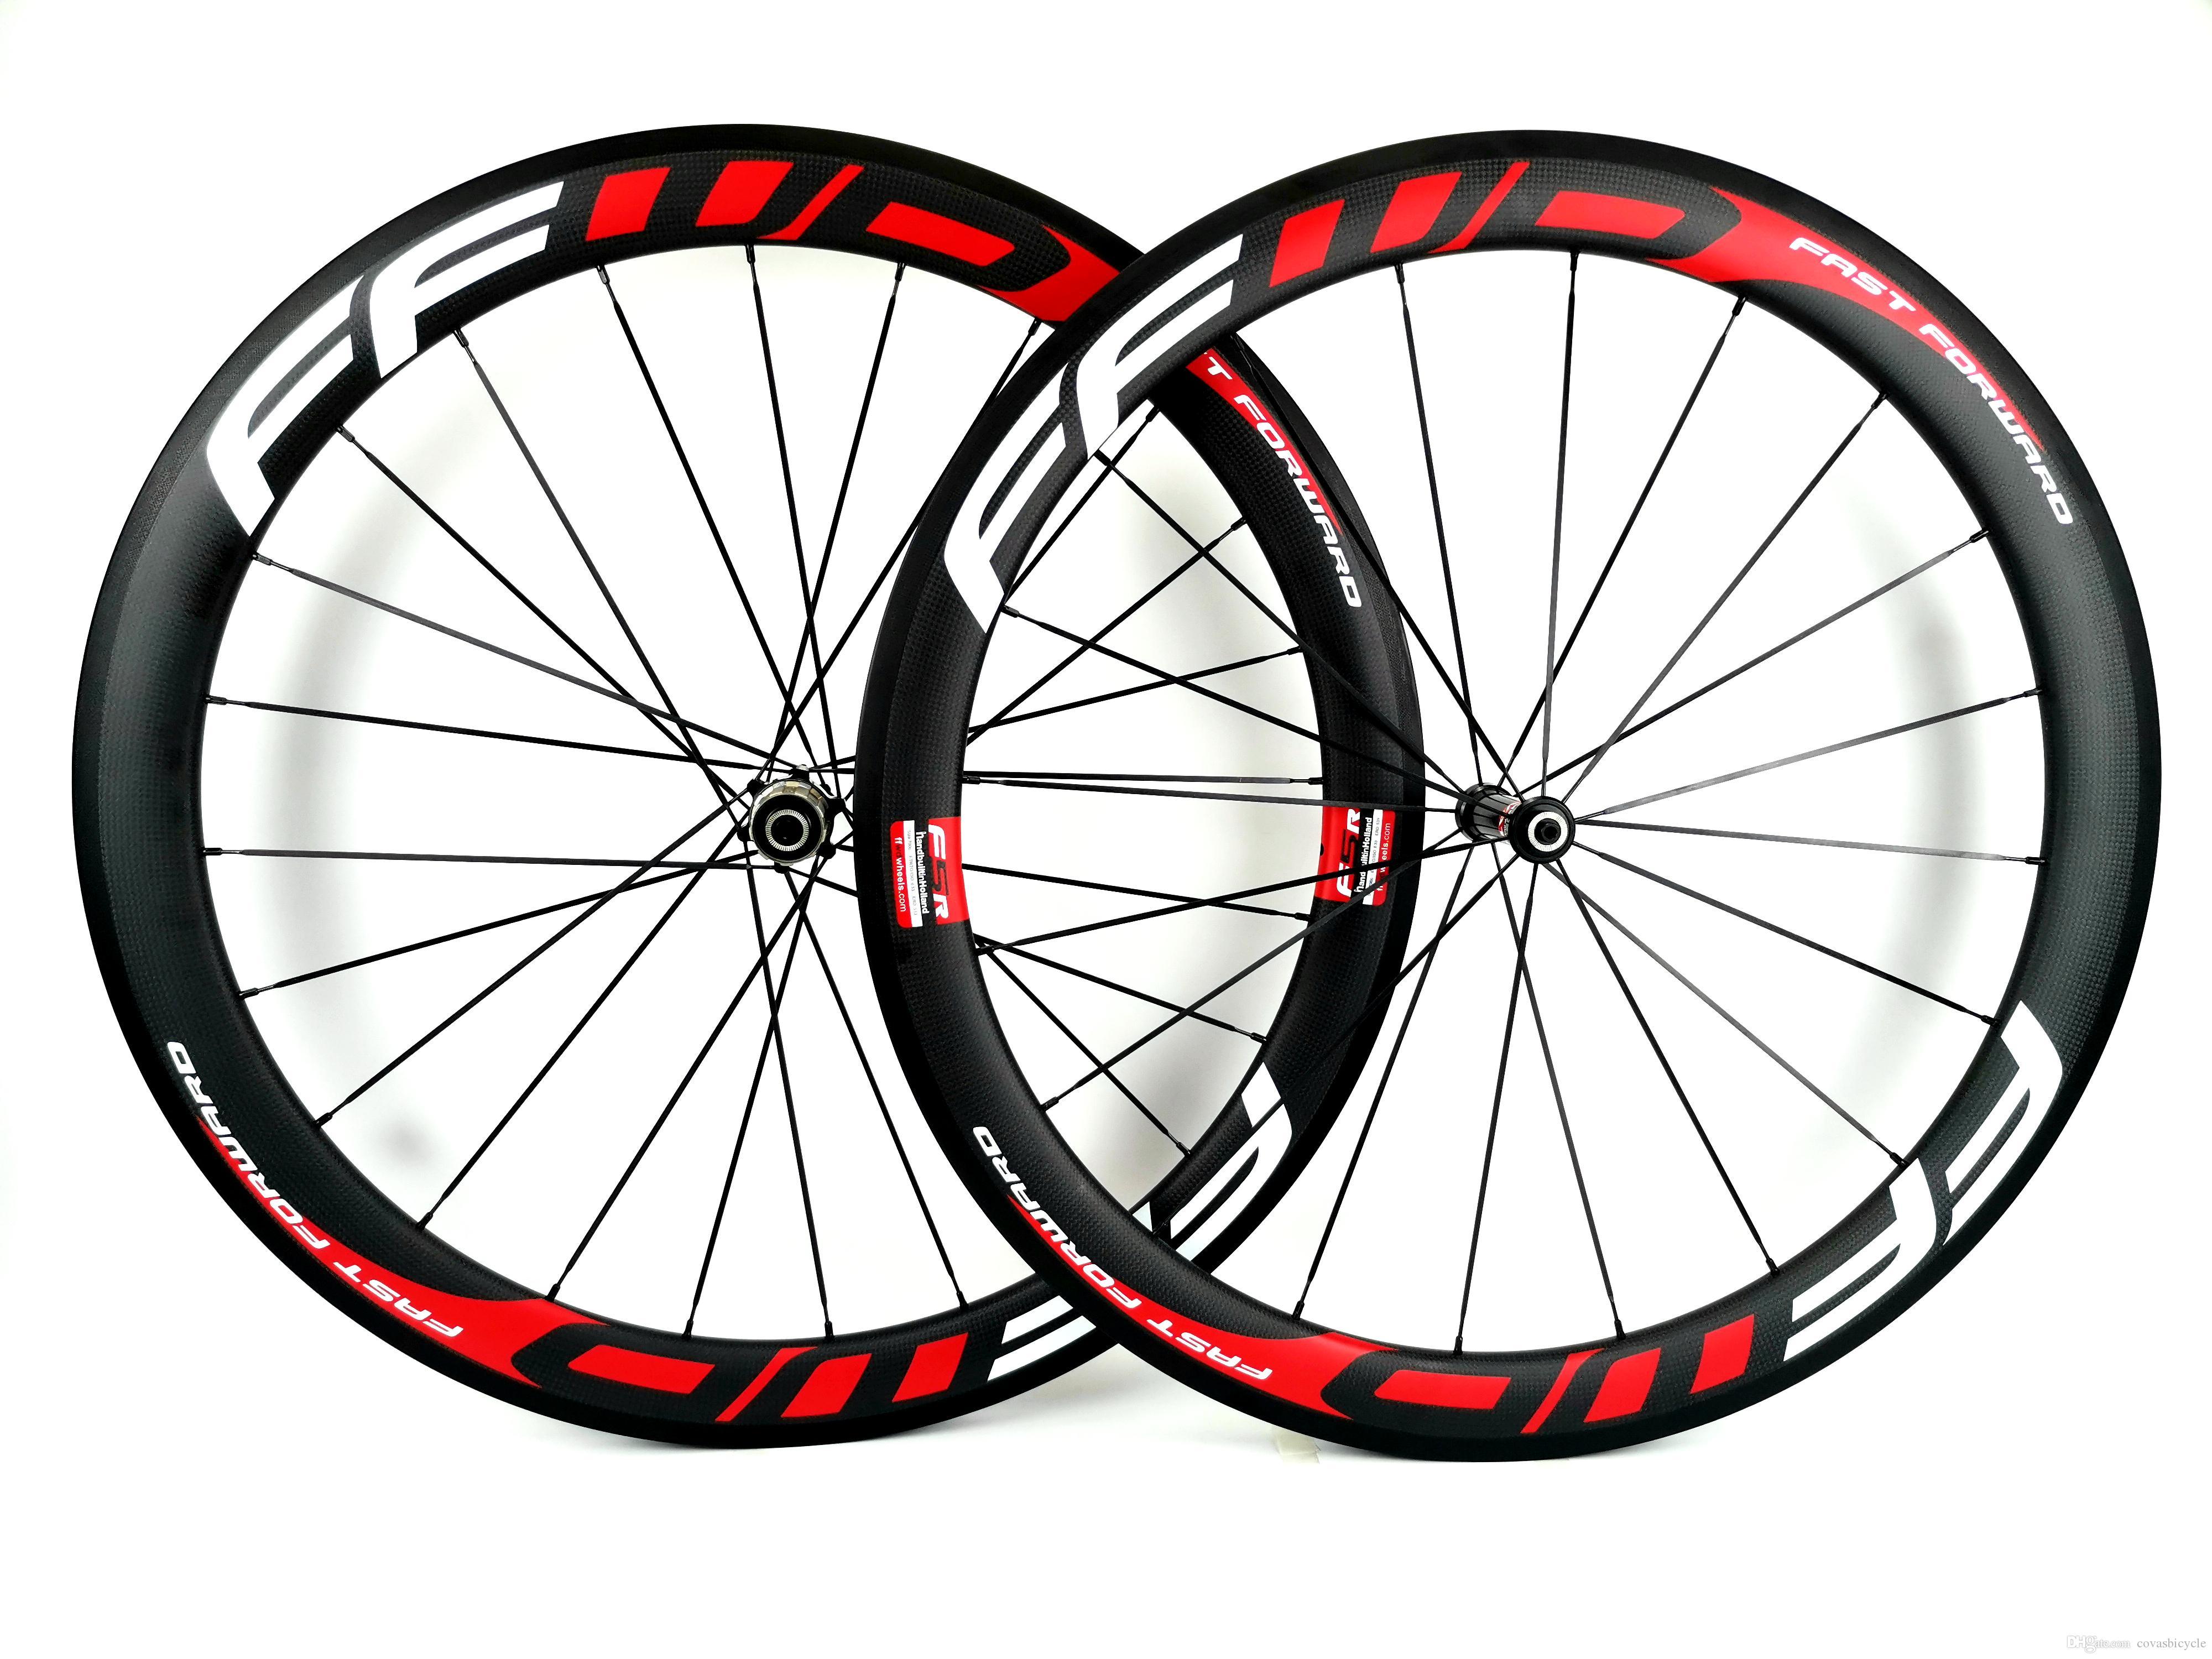 700C 50mm depth Road bike carbon wheels RACE 50 road bike 25mm width bicycle clincher/Tubular carbon wheelset U-shape rims